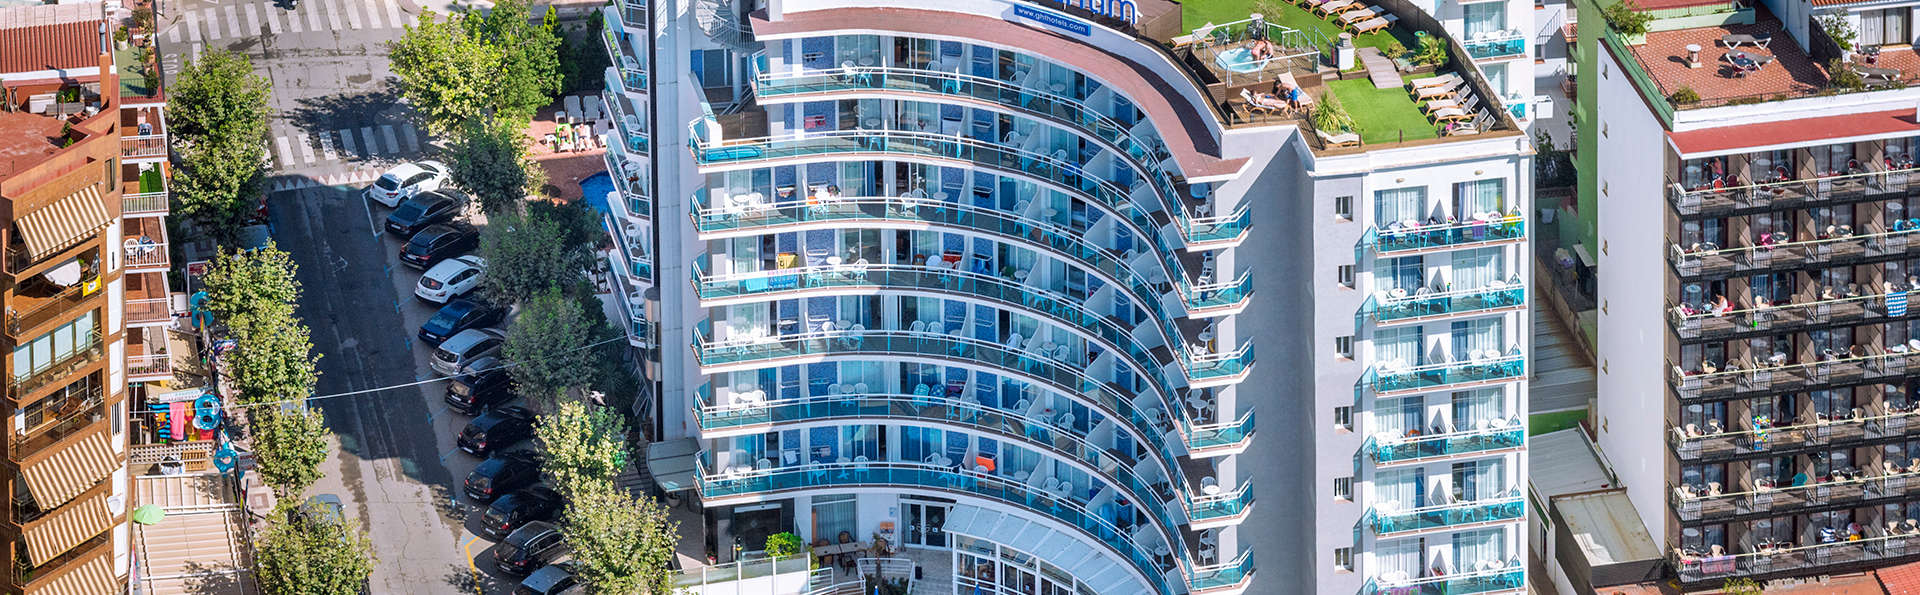 Hotel GHT Maritim - EDIT_NEW_FRONT.jpg